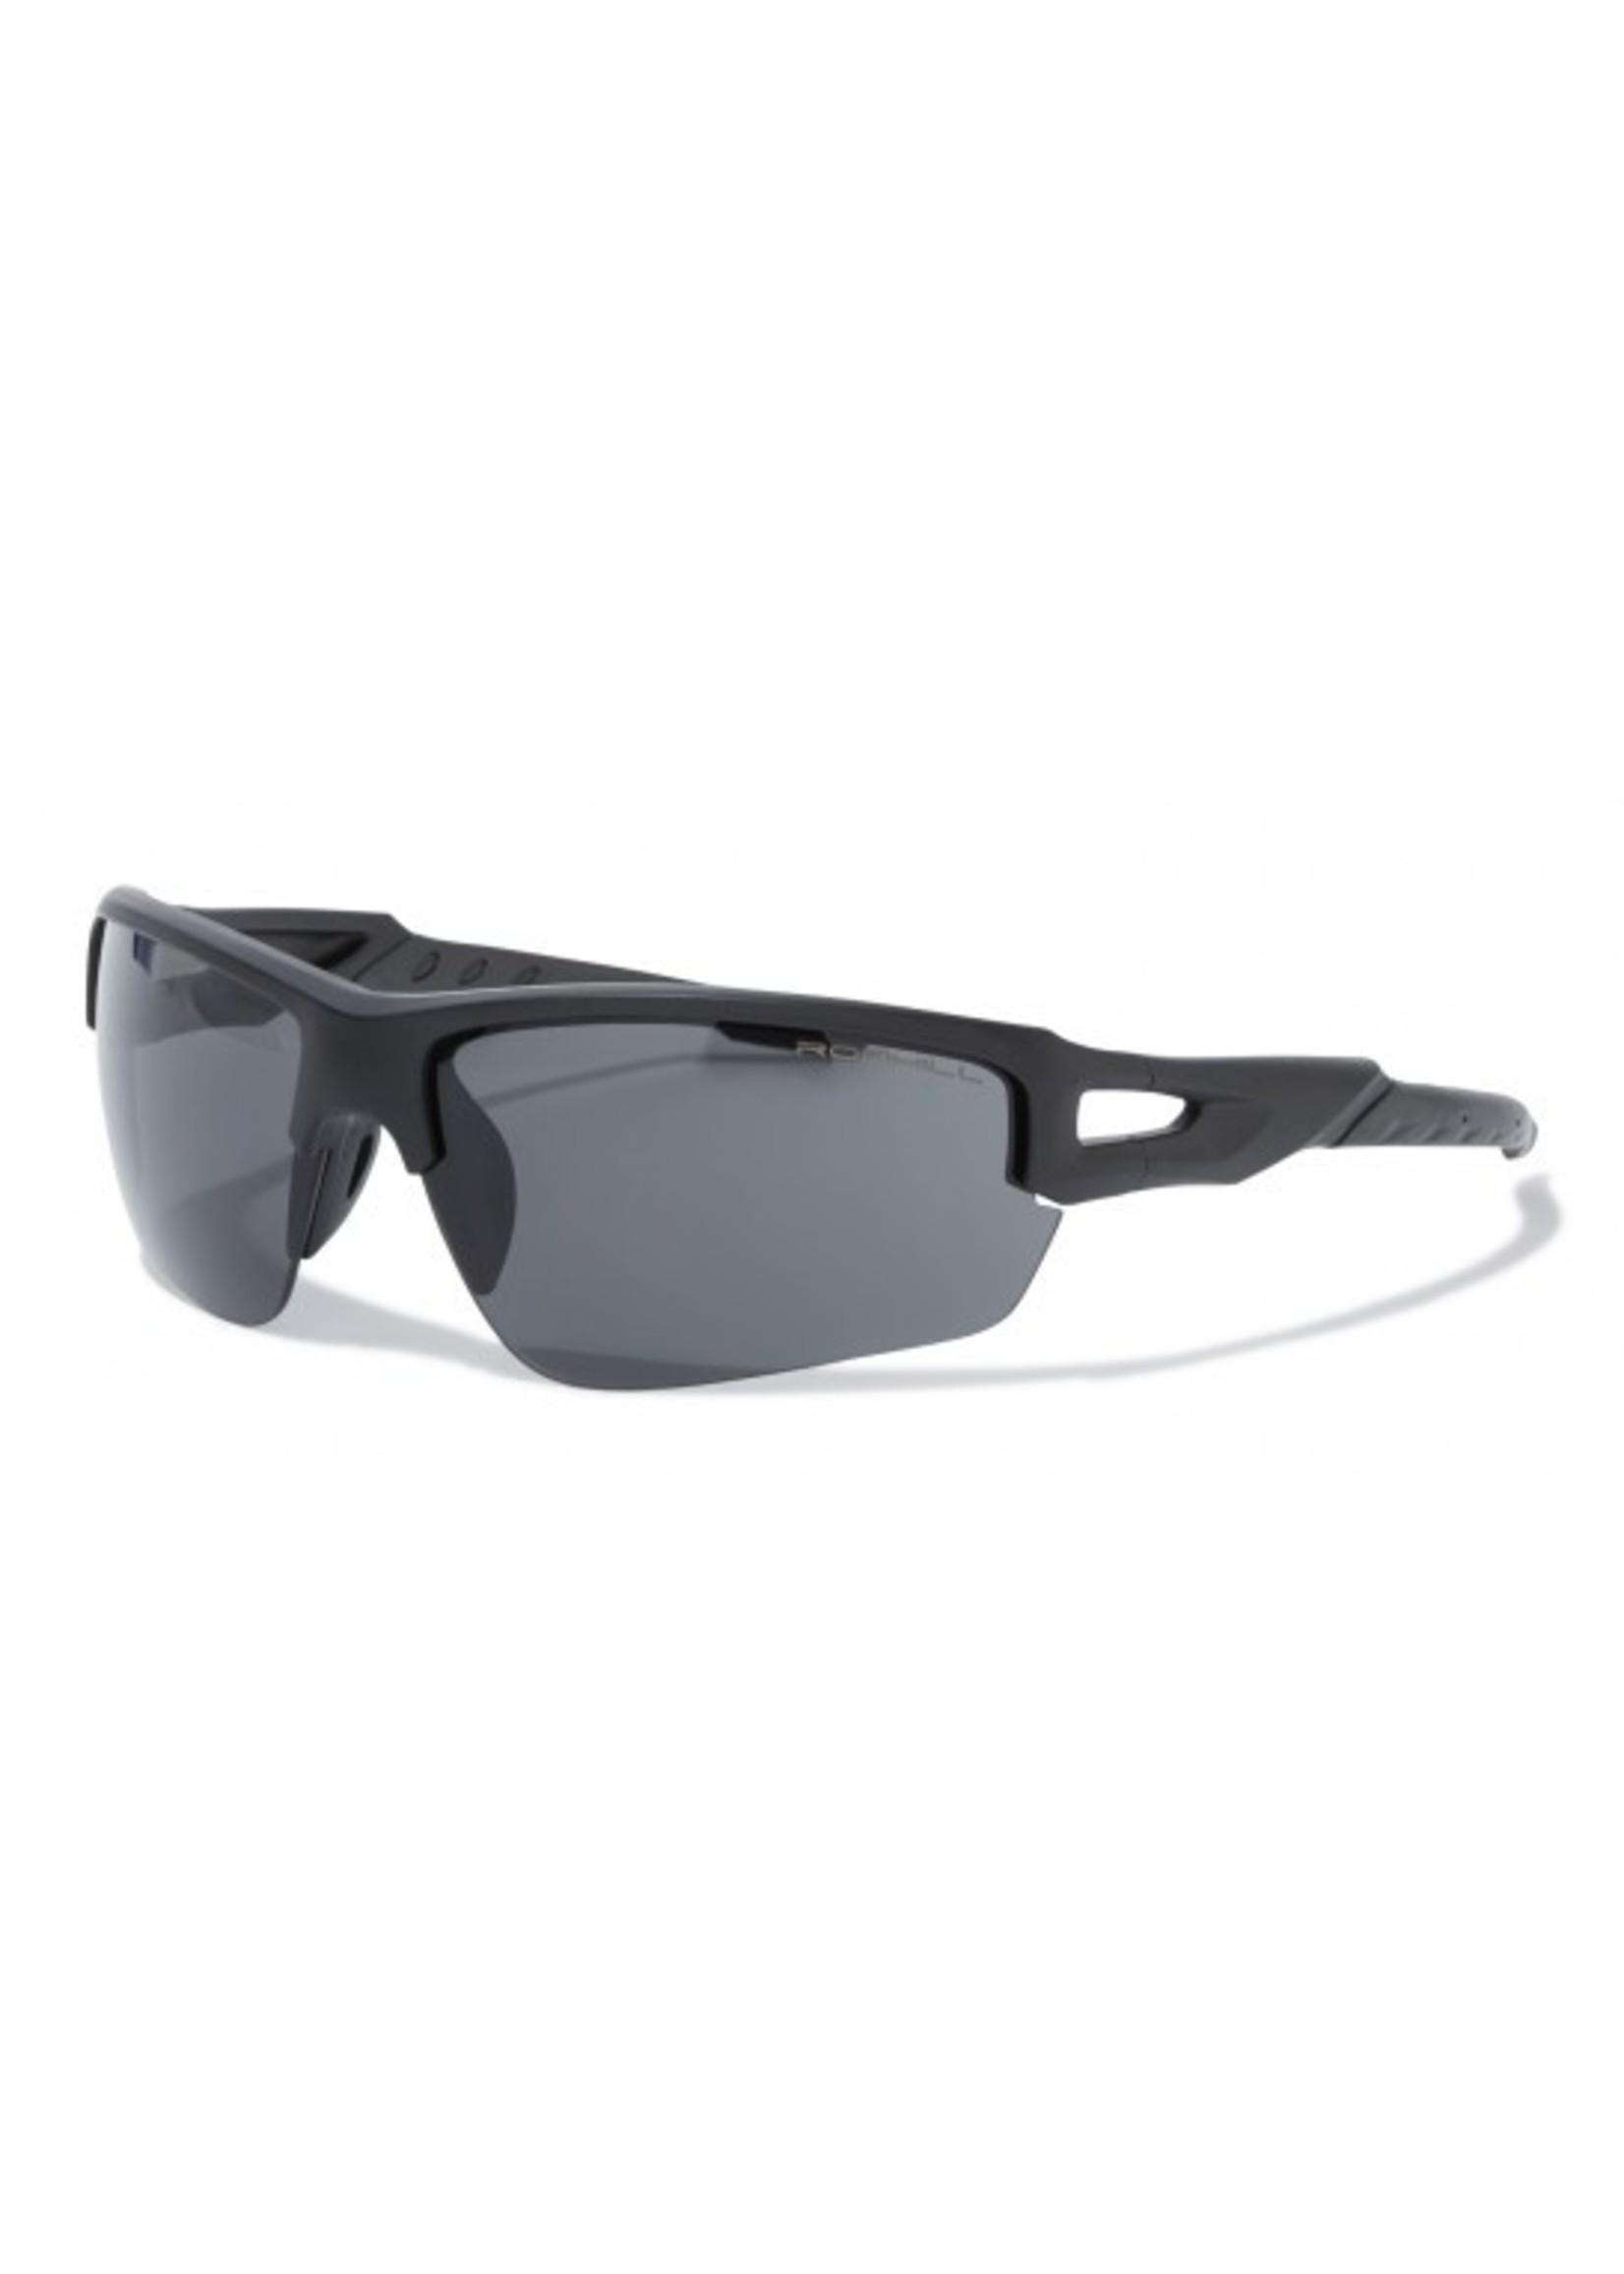 Ronhill Ronhill Munich Running Sunglasses (2020)